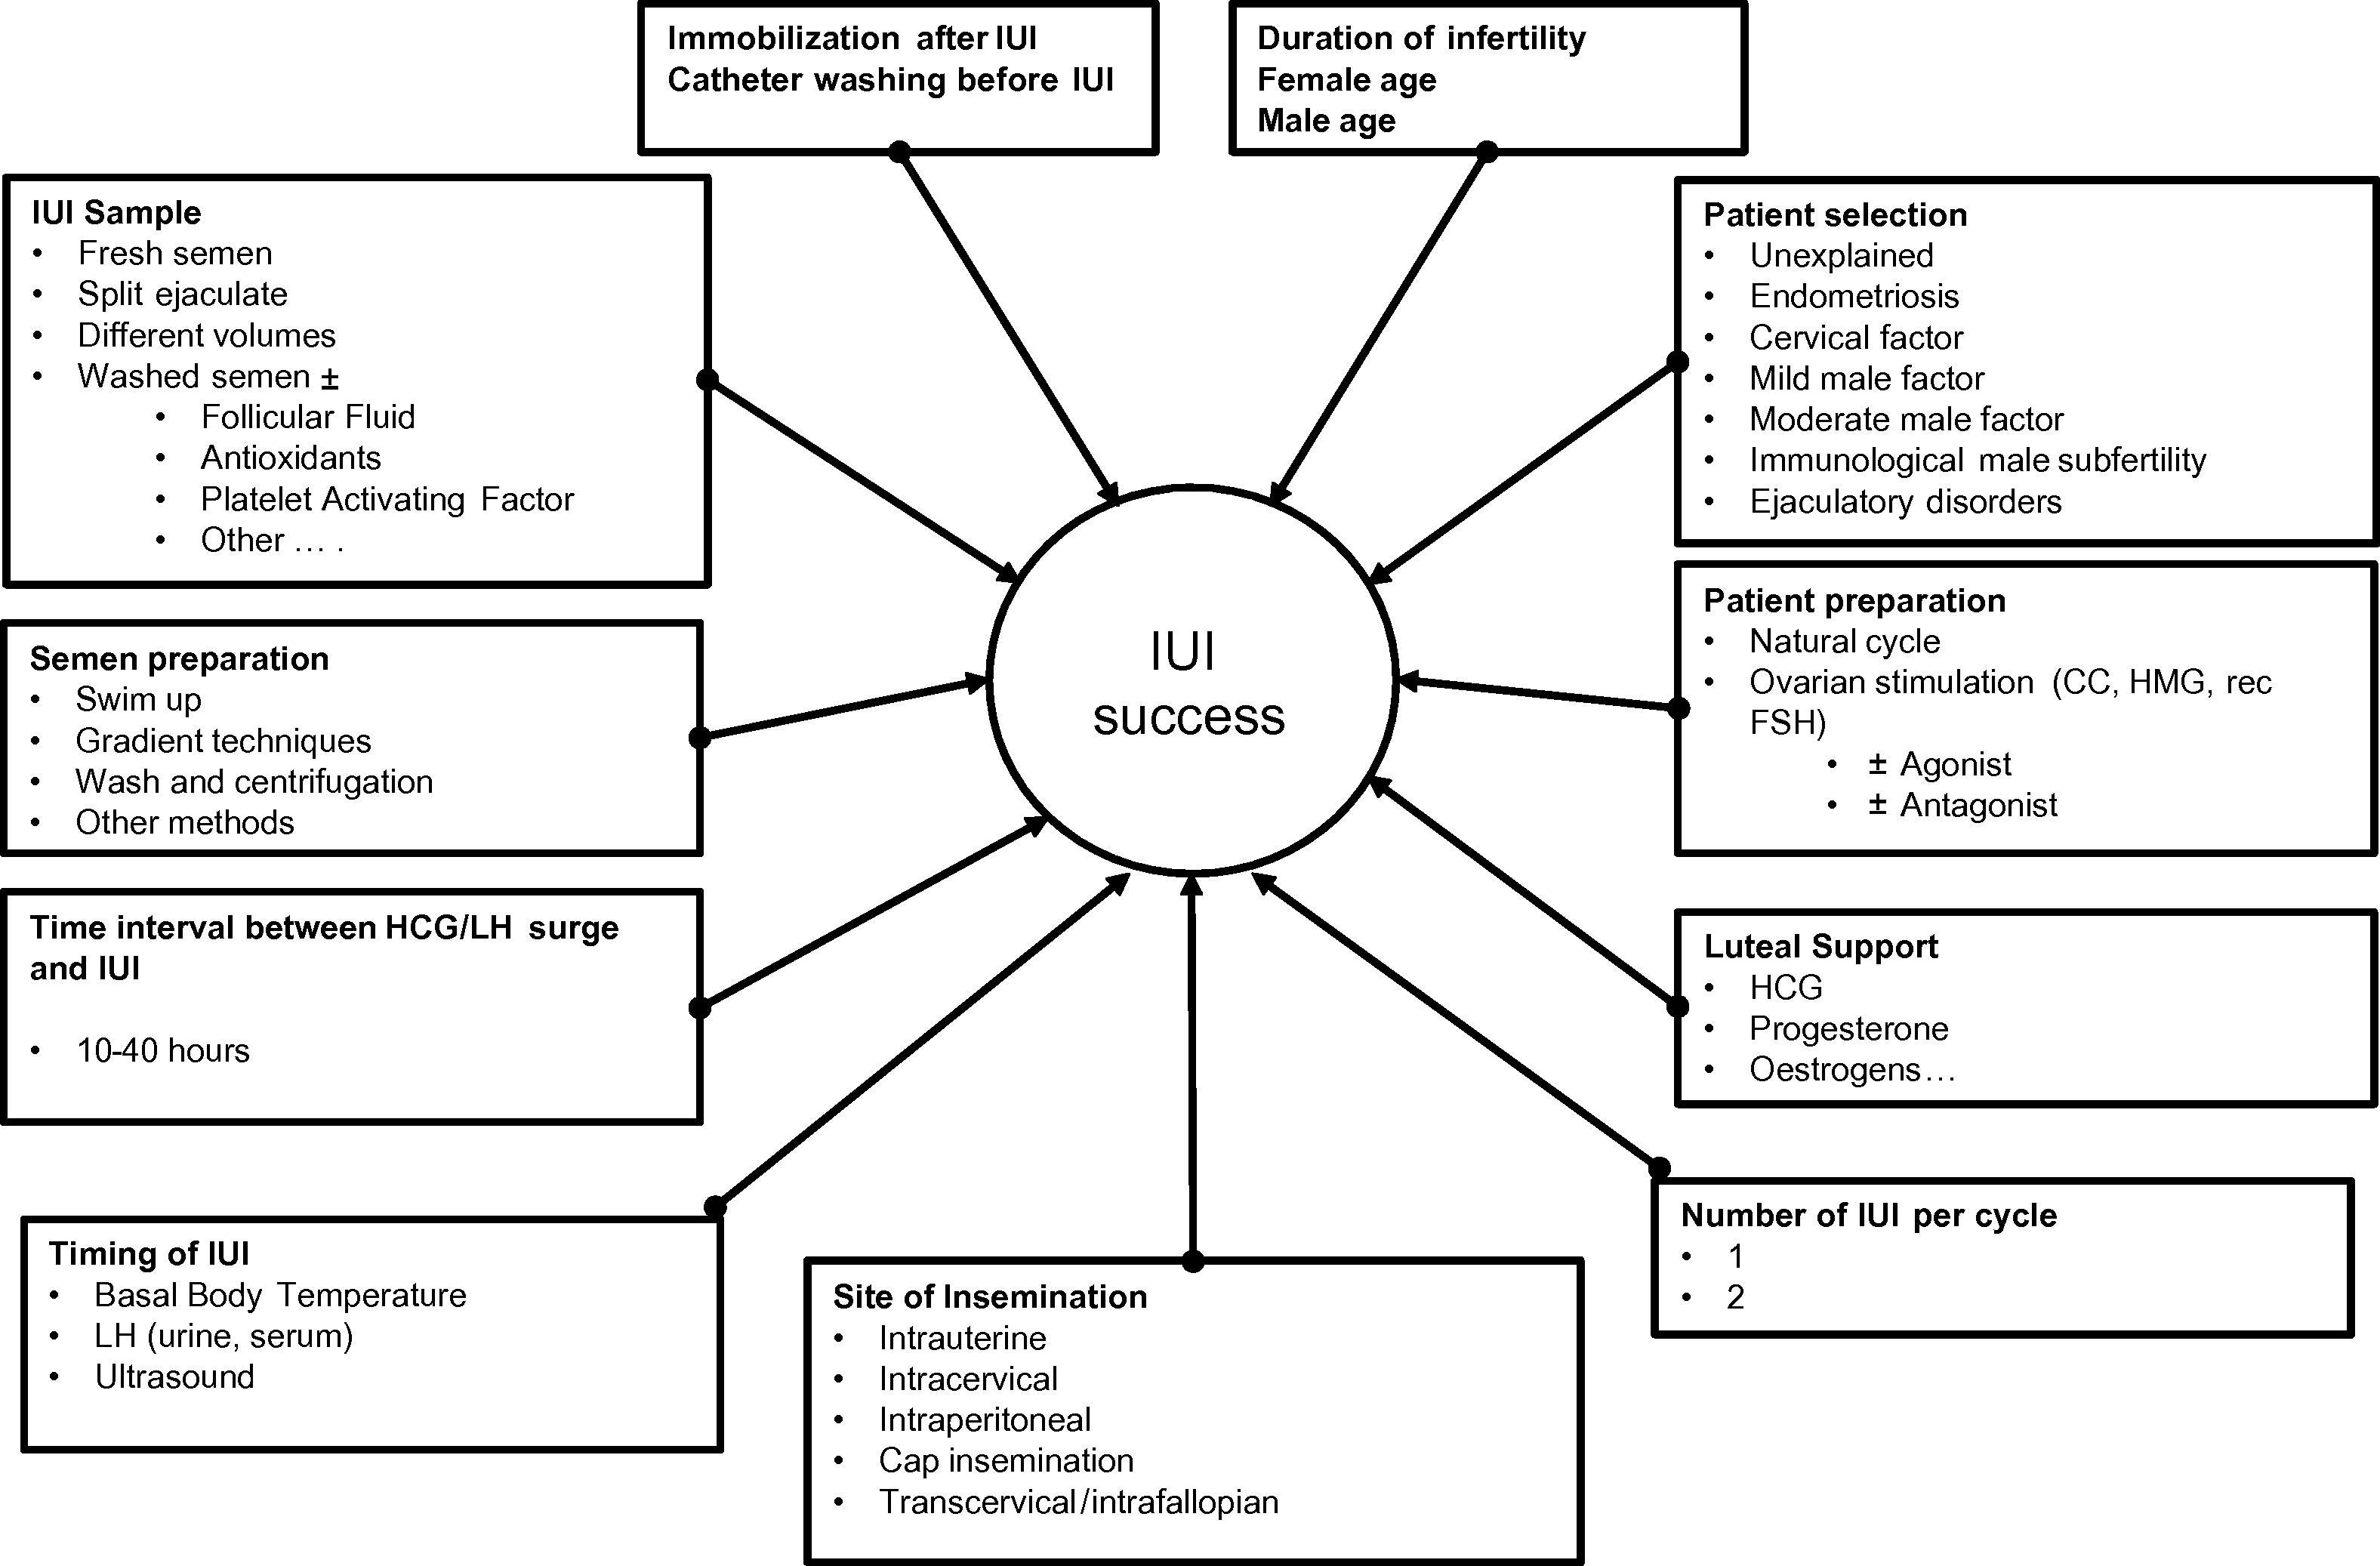 Semen quality and prediction of IUI success in male